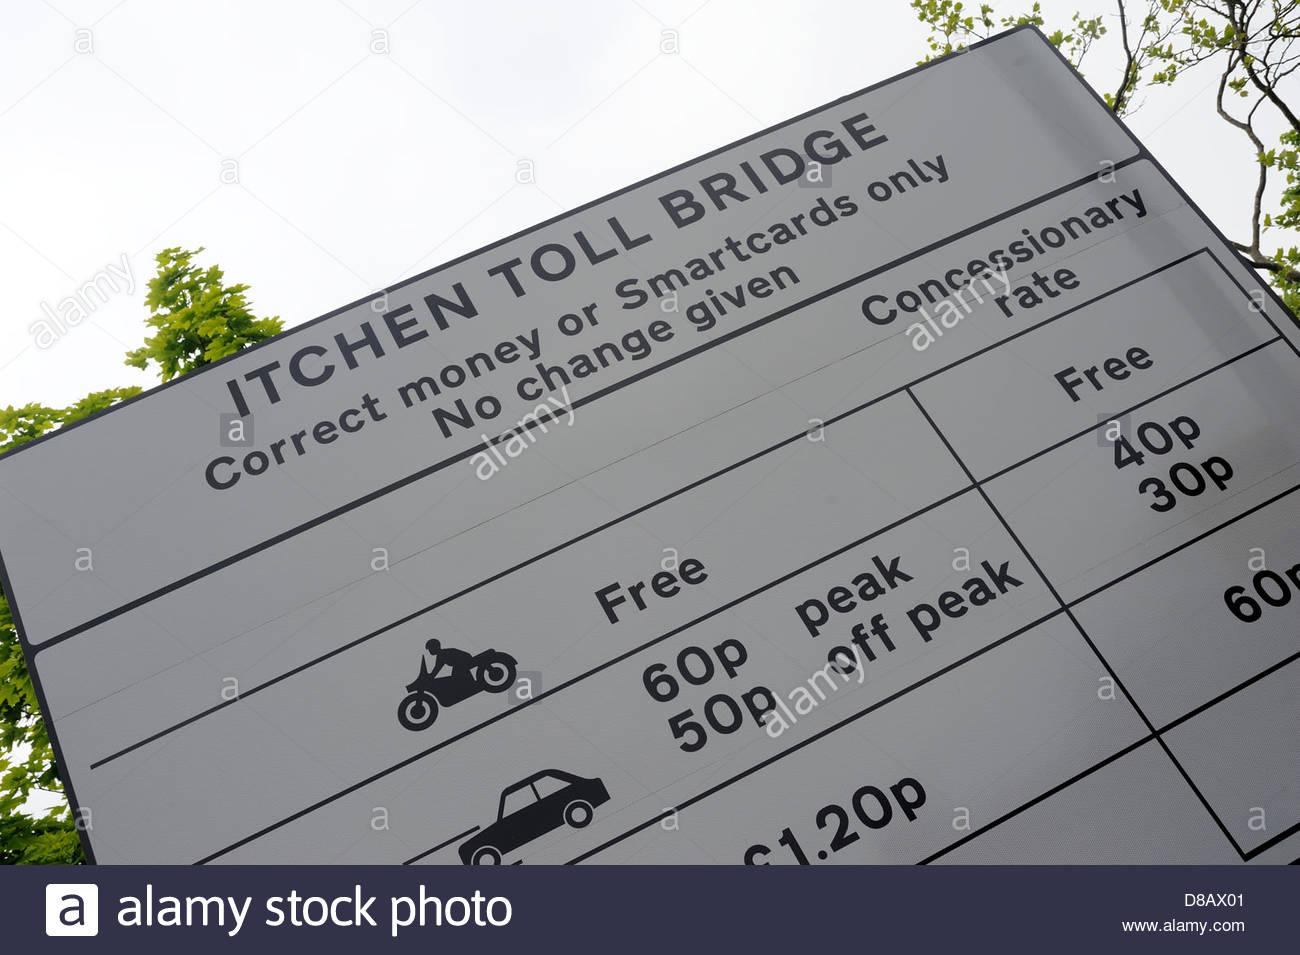 Itchen Toll Bridge Southampton UK Tariffs, Correct change or smart card only. - Stock Image